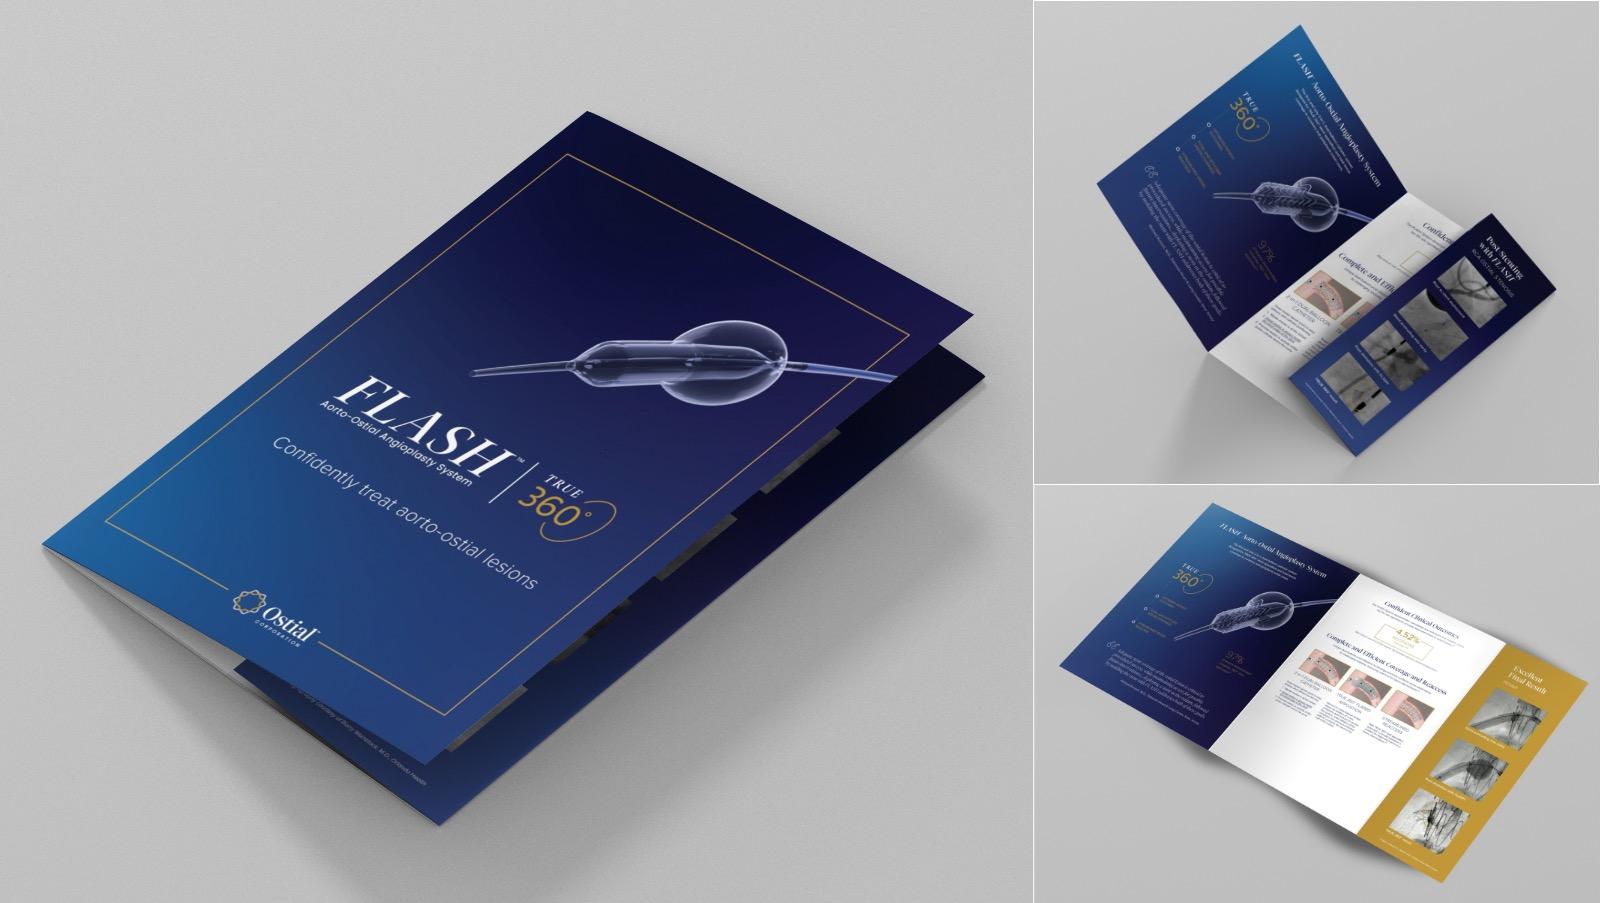 Ostial Corporation - Flash 360 Brochure Design